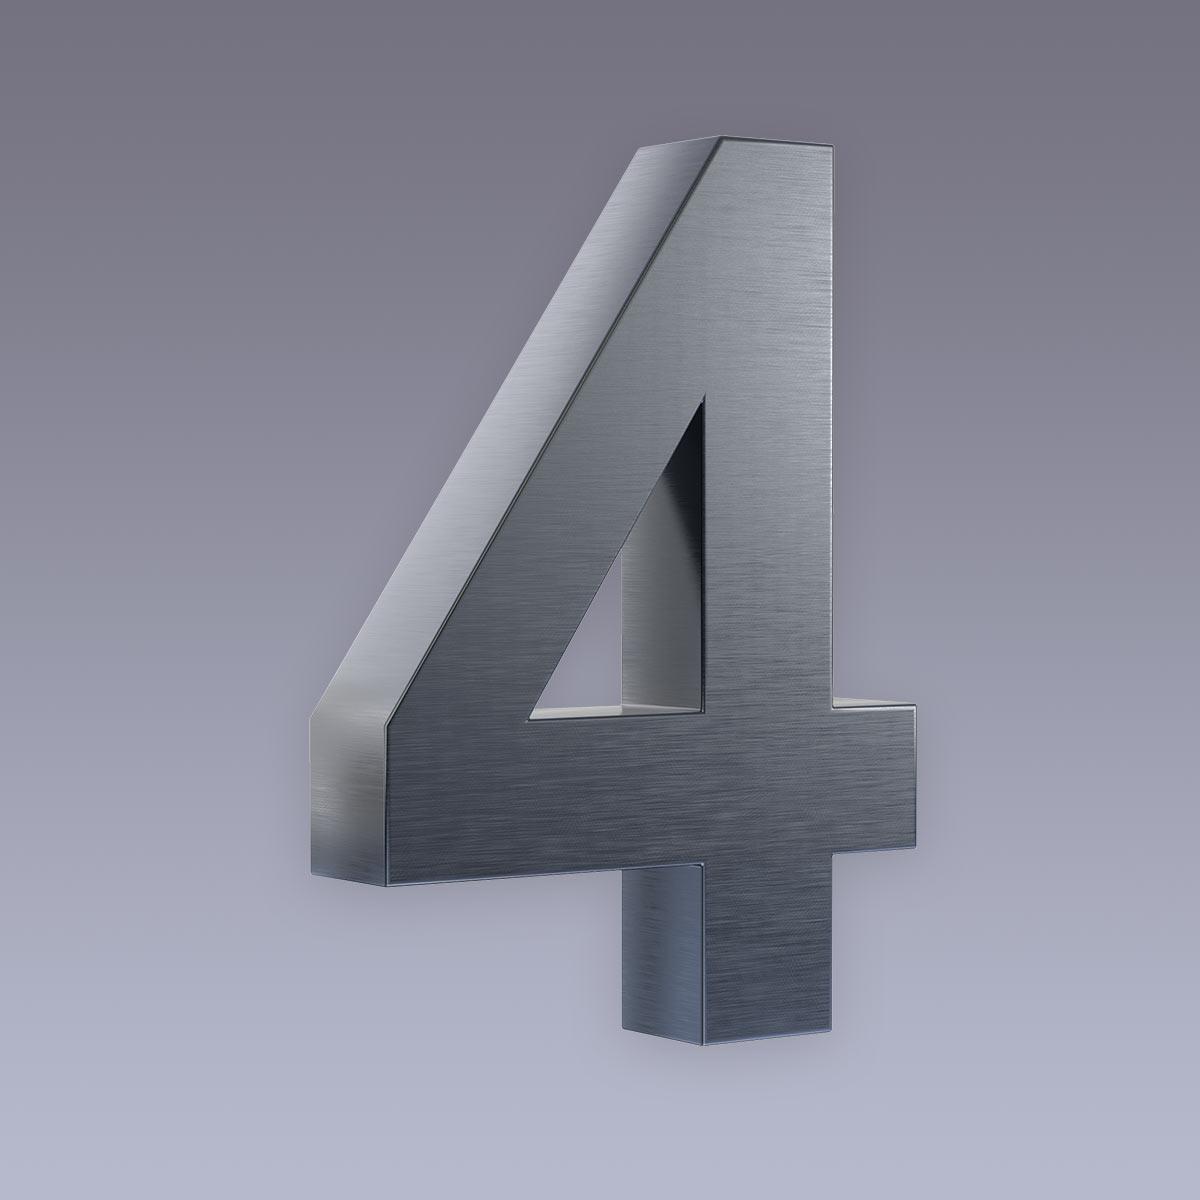 3D Hausnummer 4 Edelstahl anthrazit RAL7016 in 3D Design Arial